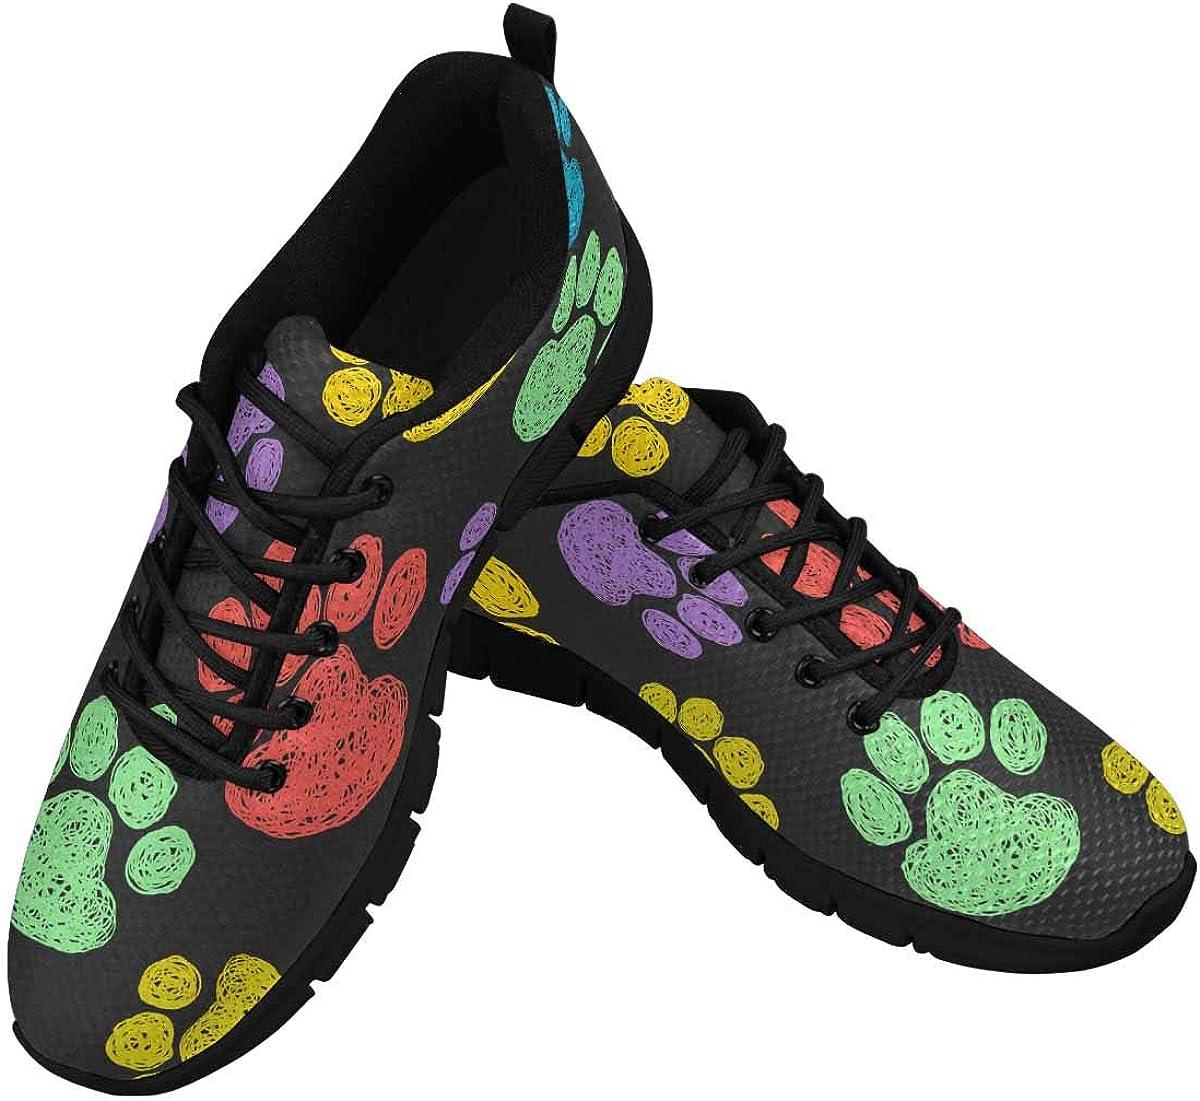 INTERESTPRINT Paw Print Women's Walking Shoes Lightweight Casual Running Sneakers